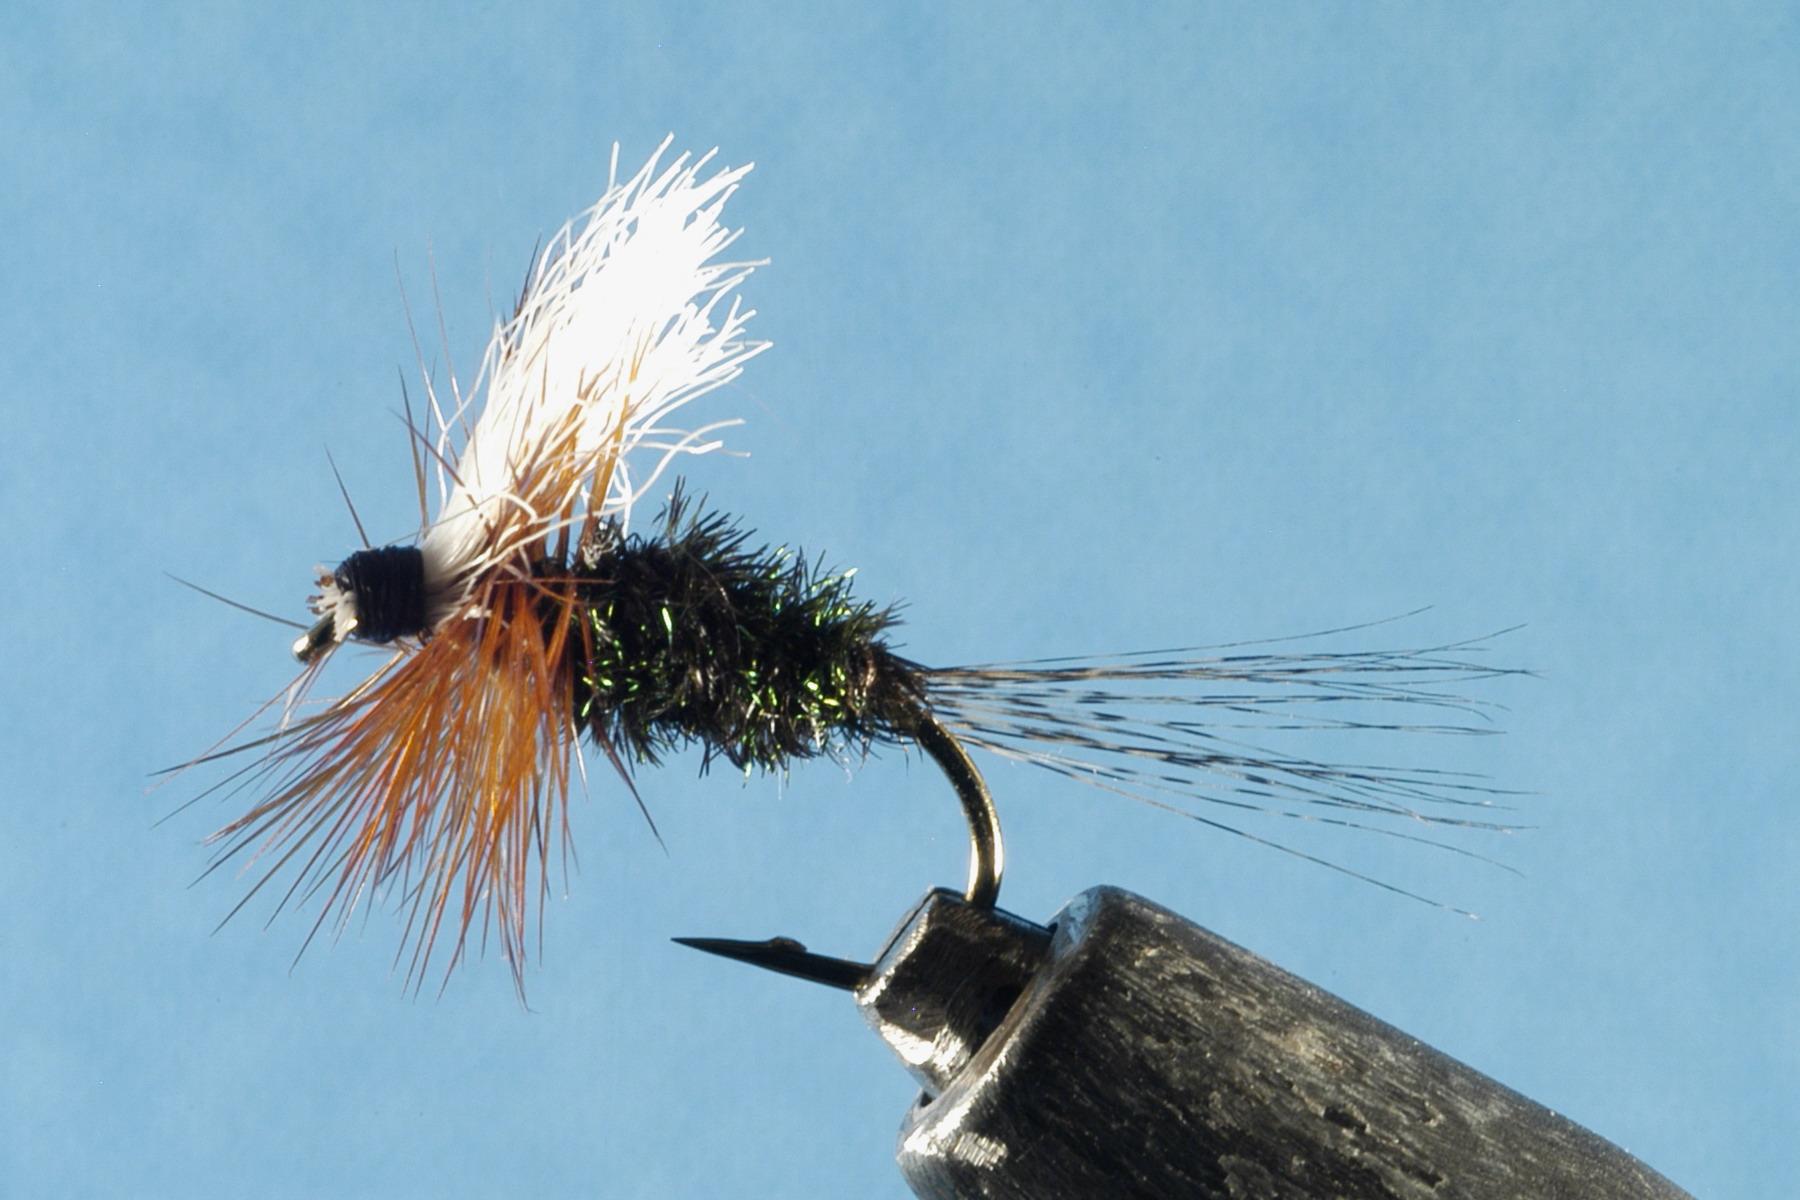 Blue gill fly